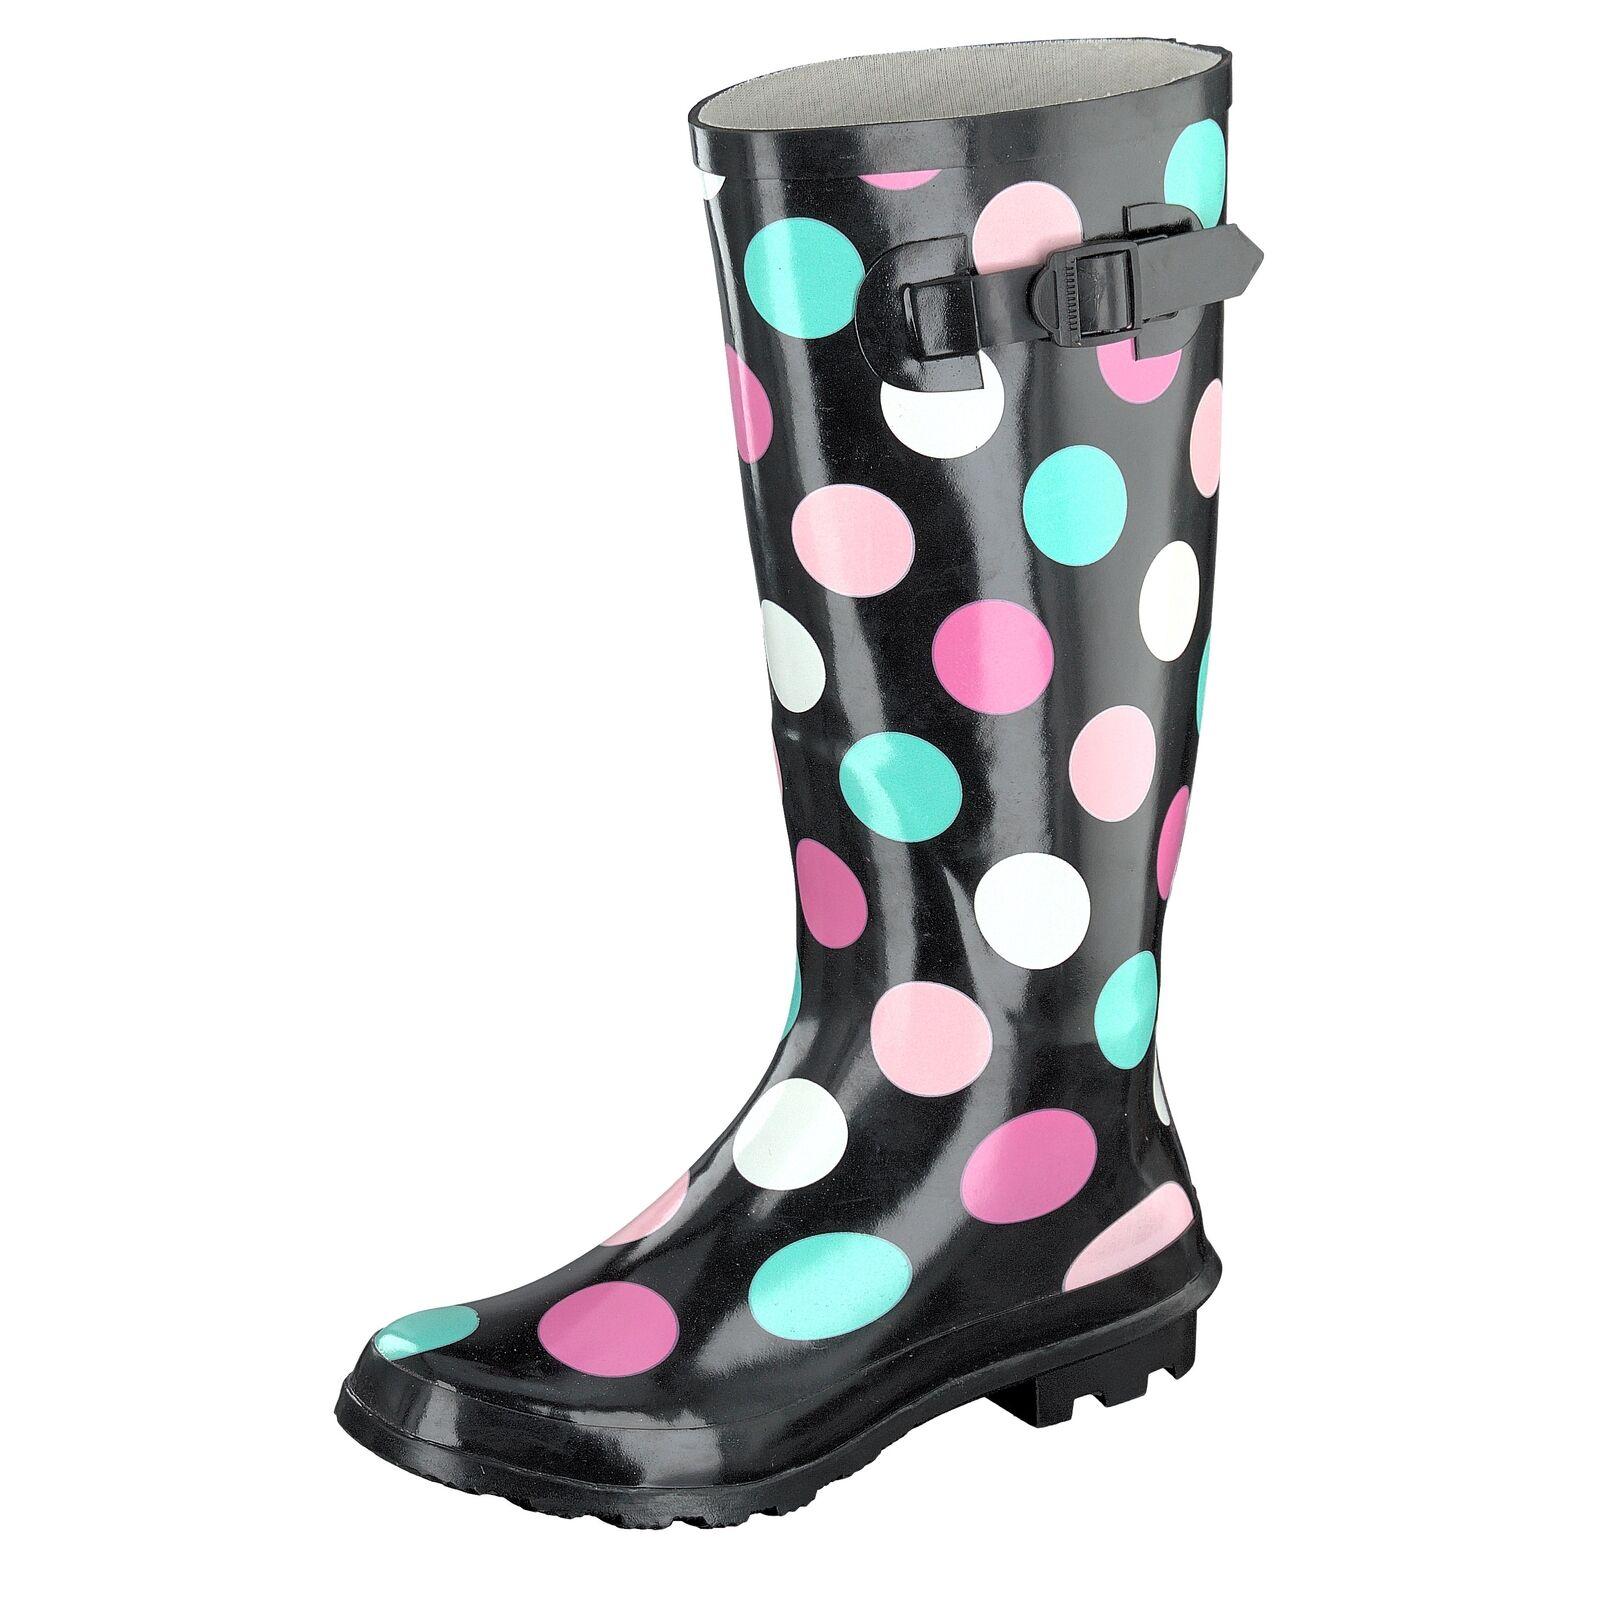 Gosch Gosch Gosch zapatos Sylt Mujer botas De Agua caña alta 7108-501-9 Negro Lunares  nuevo listado